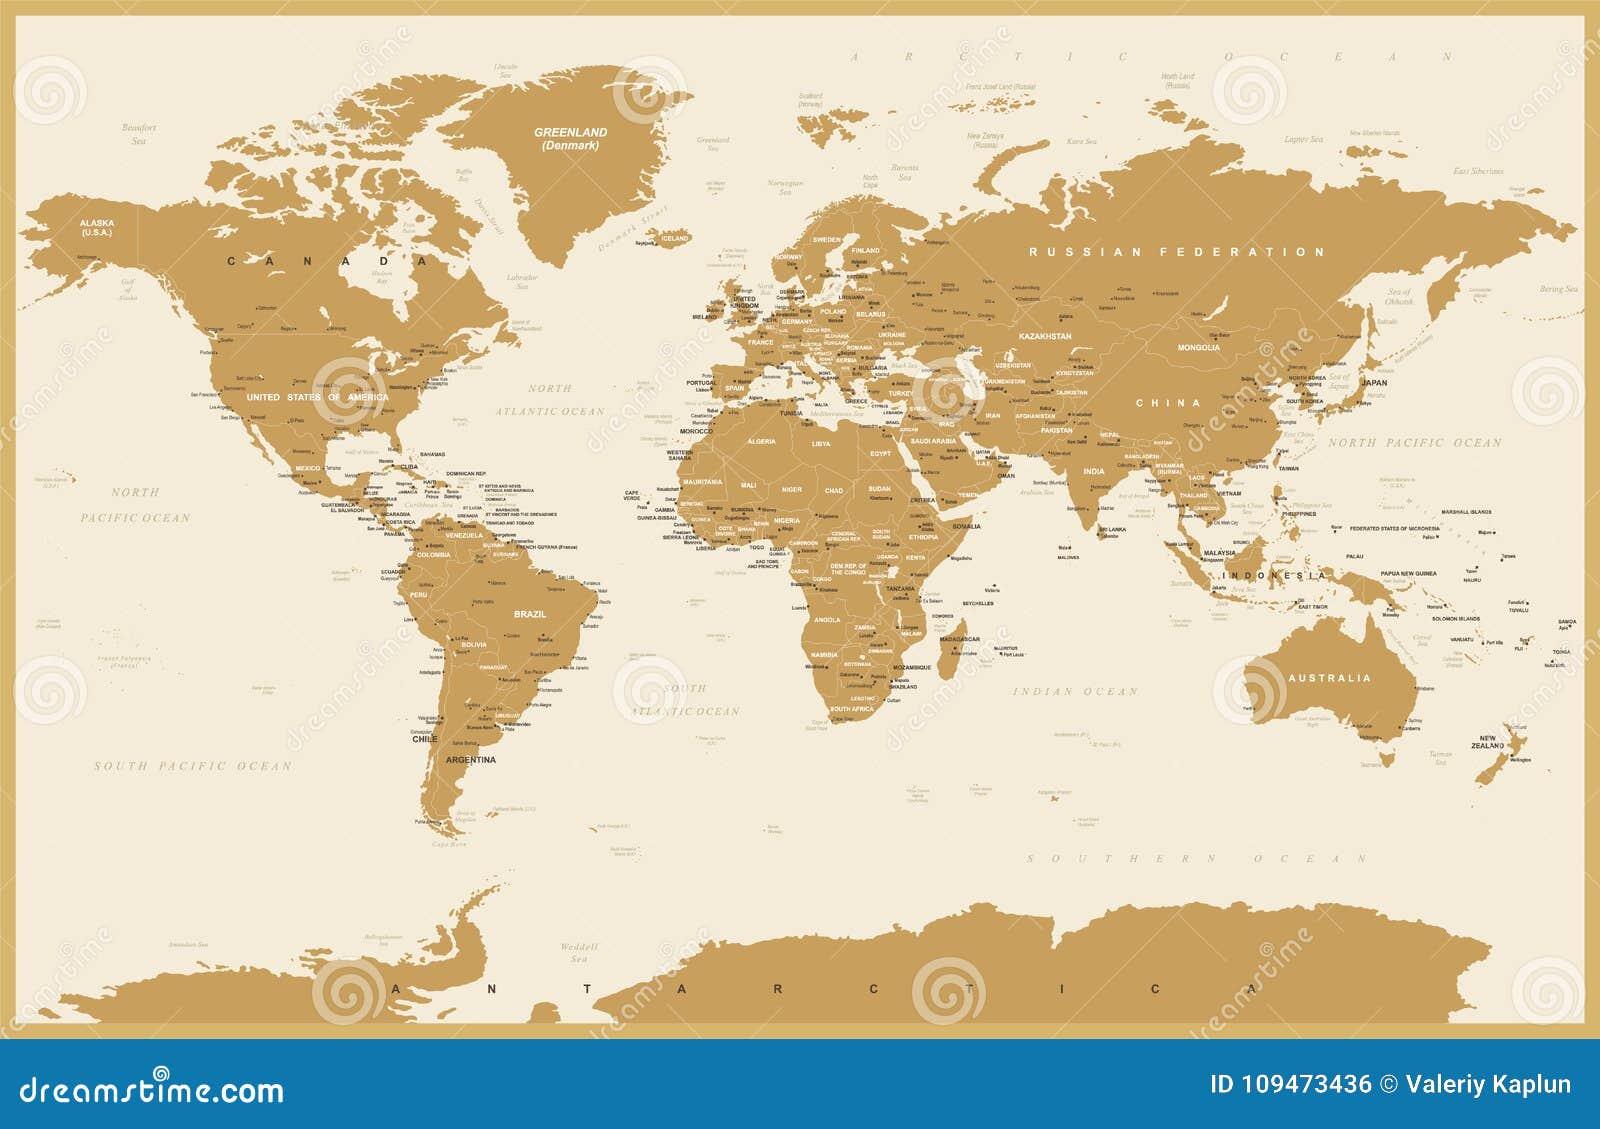 Jordan Political Map Eps Illustrator Map: Political Vintage World Map Vector Stock Illustration